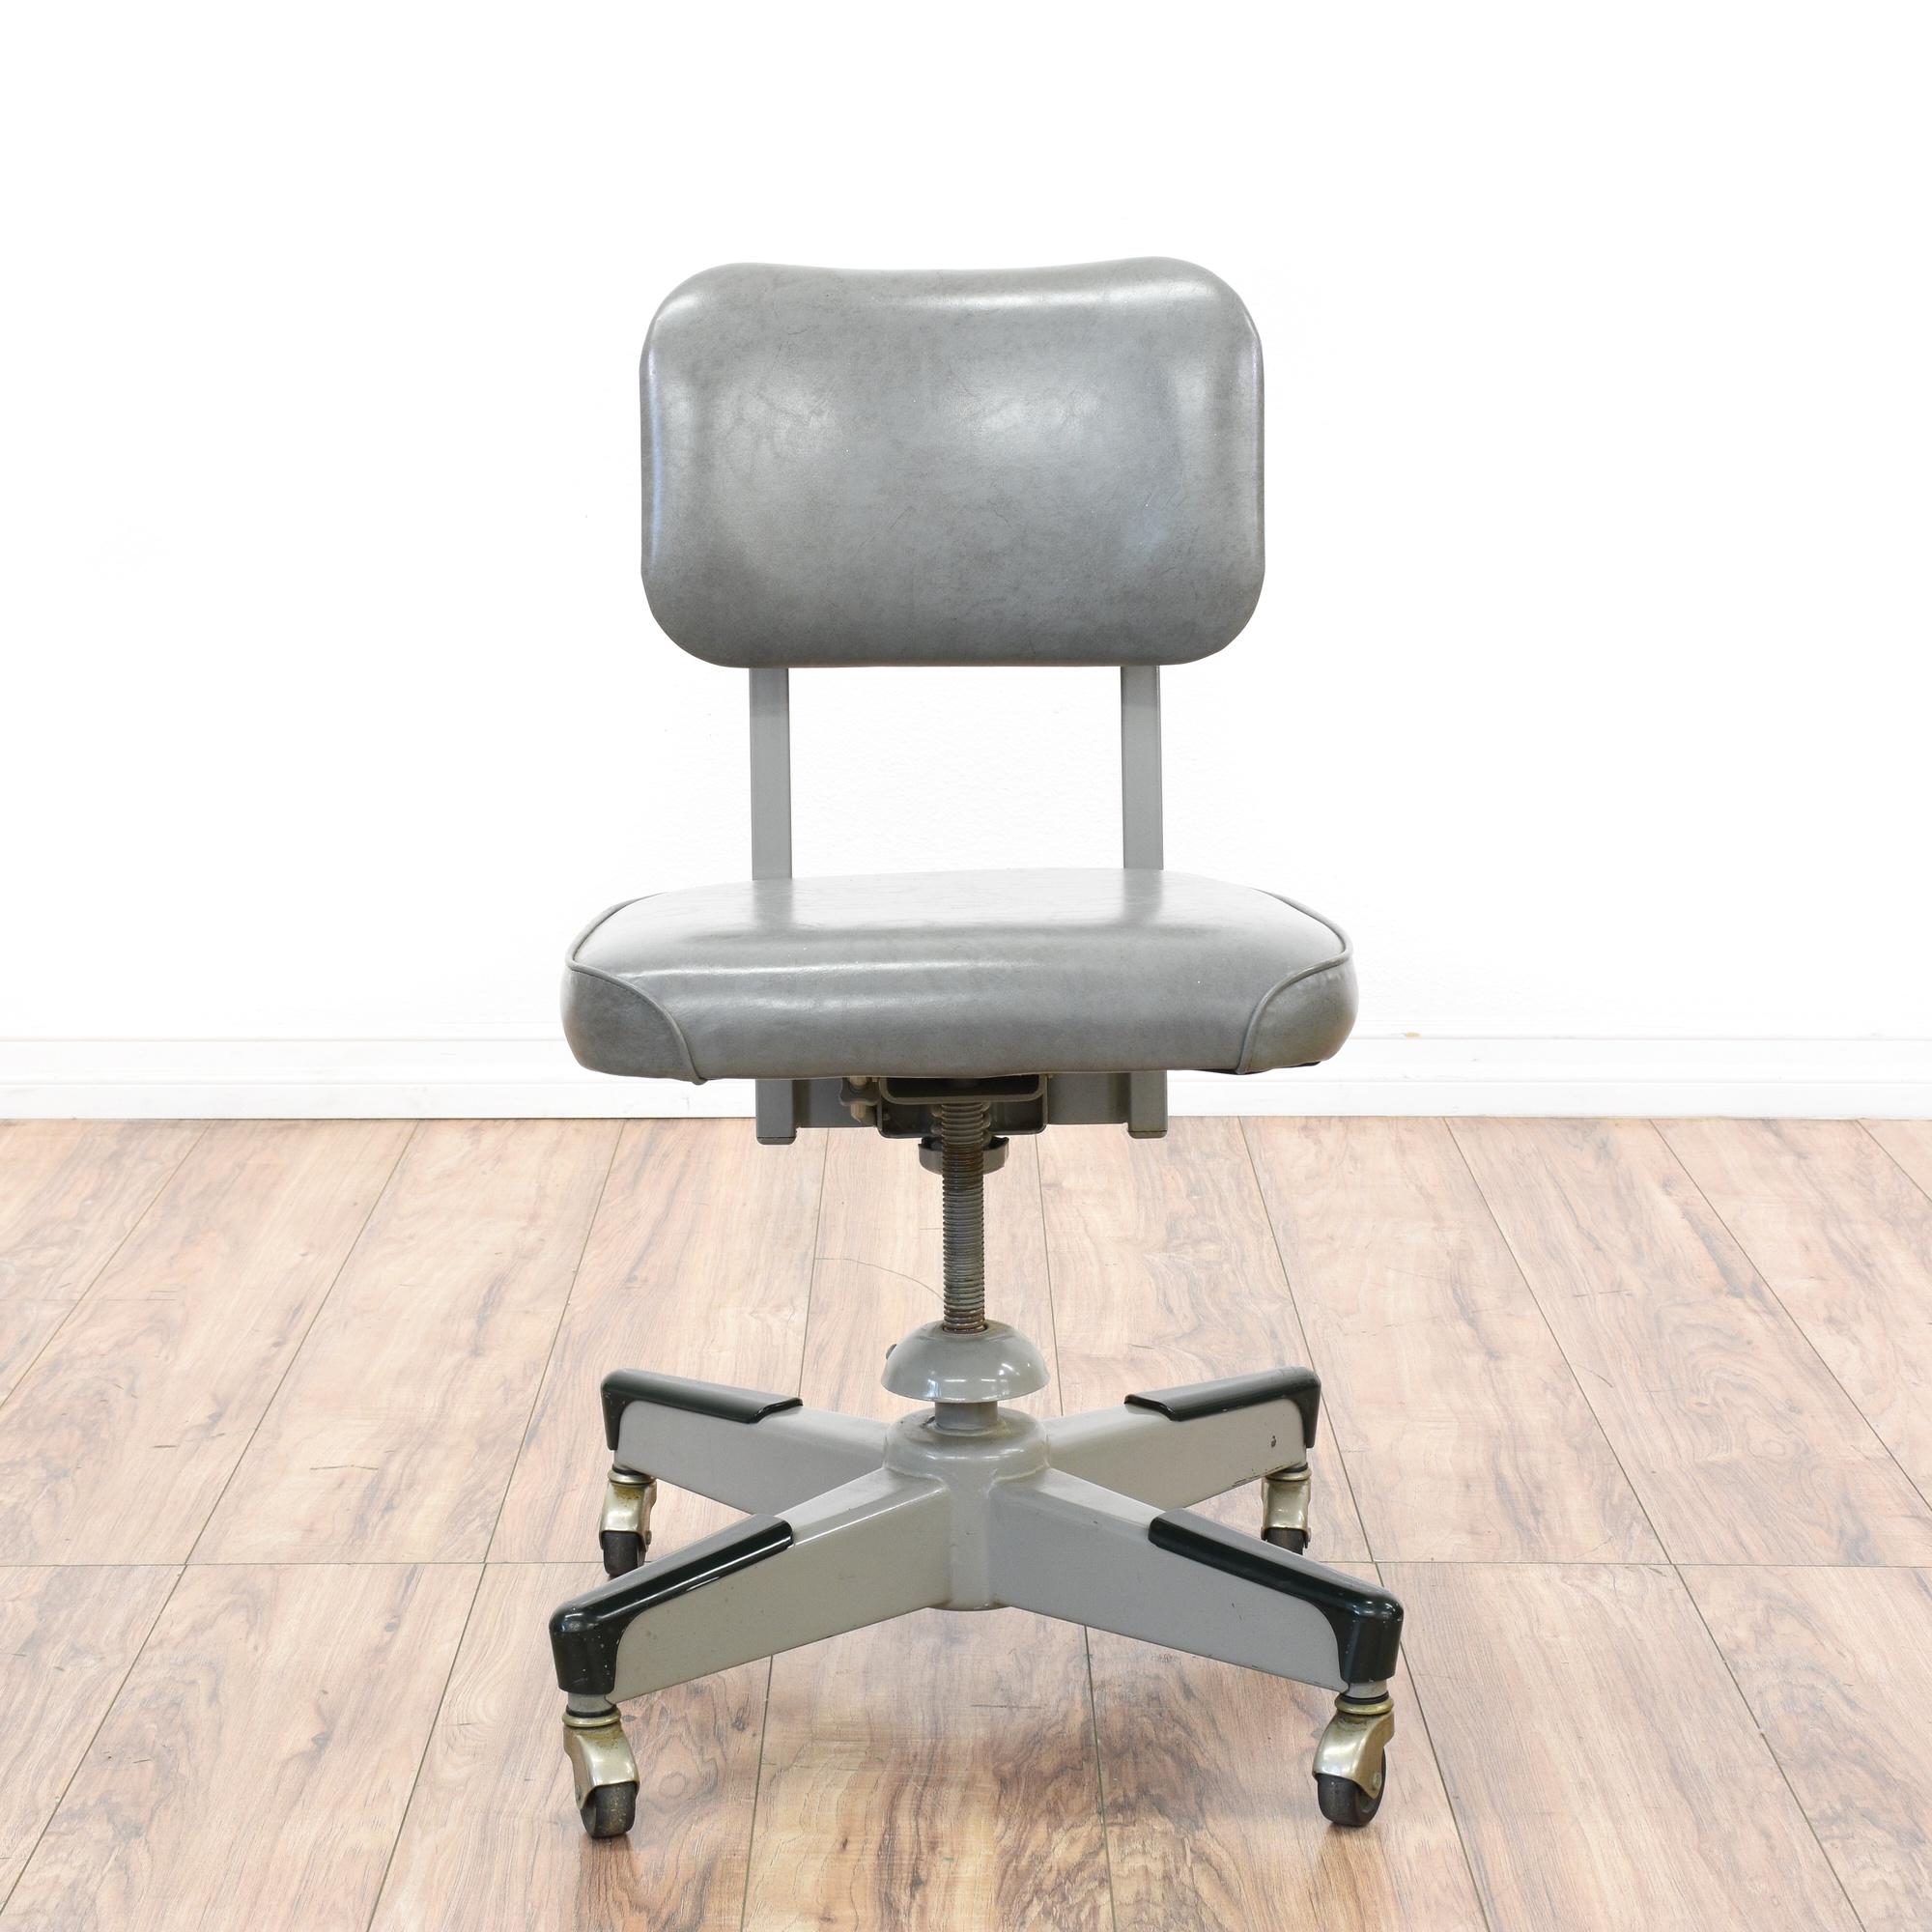 Retro Industrial Gray Vinyl & Metal Office Chair